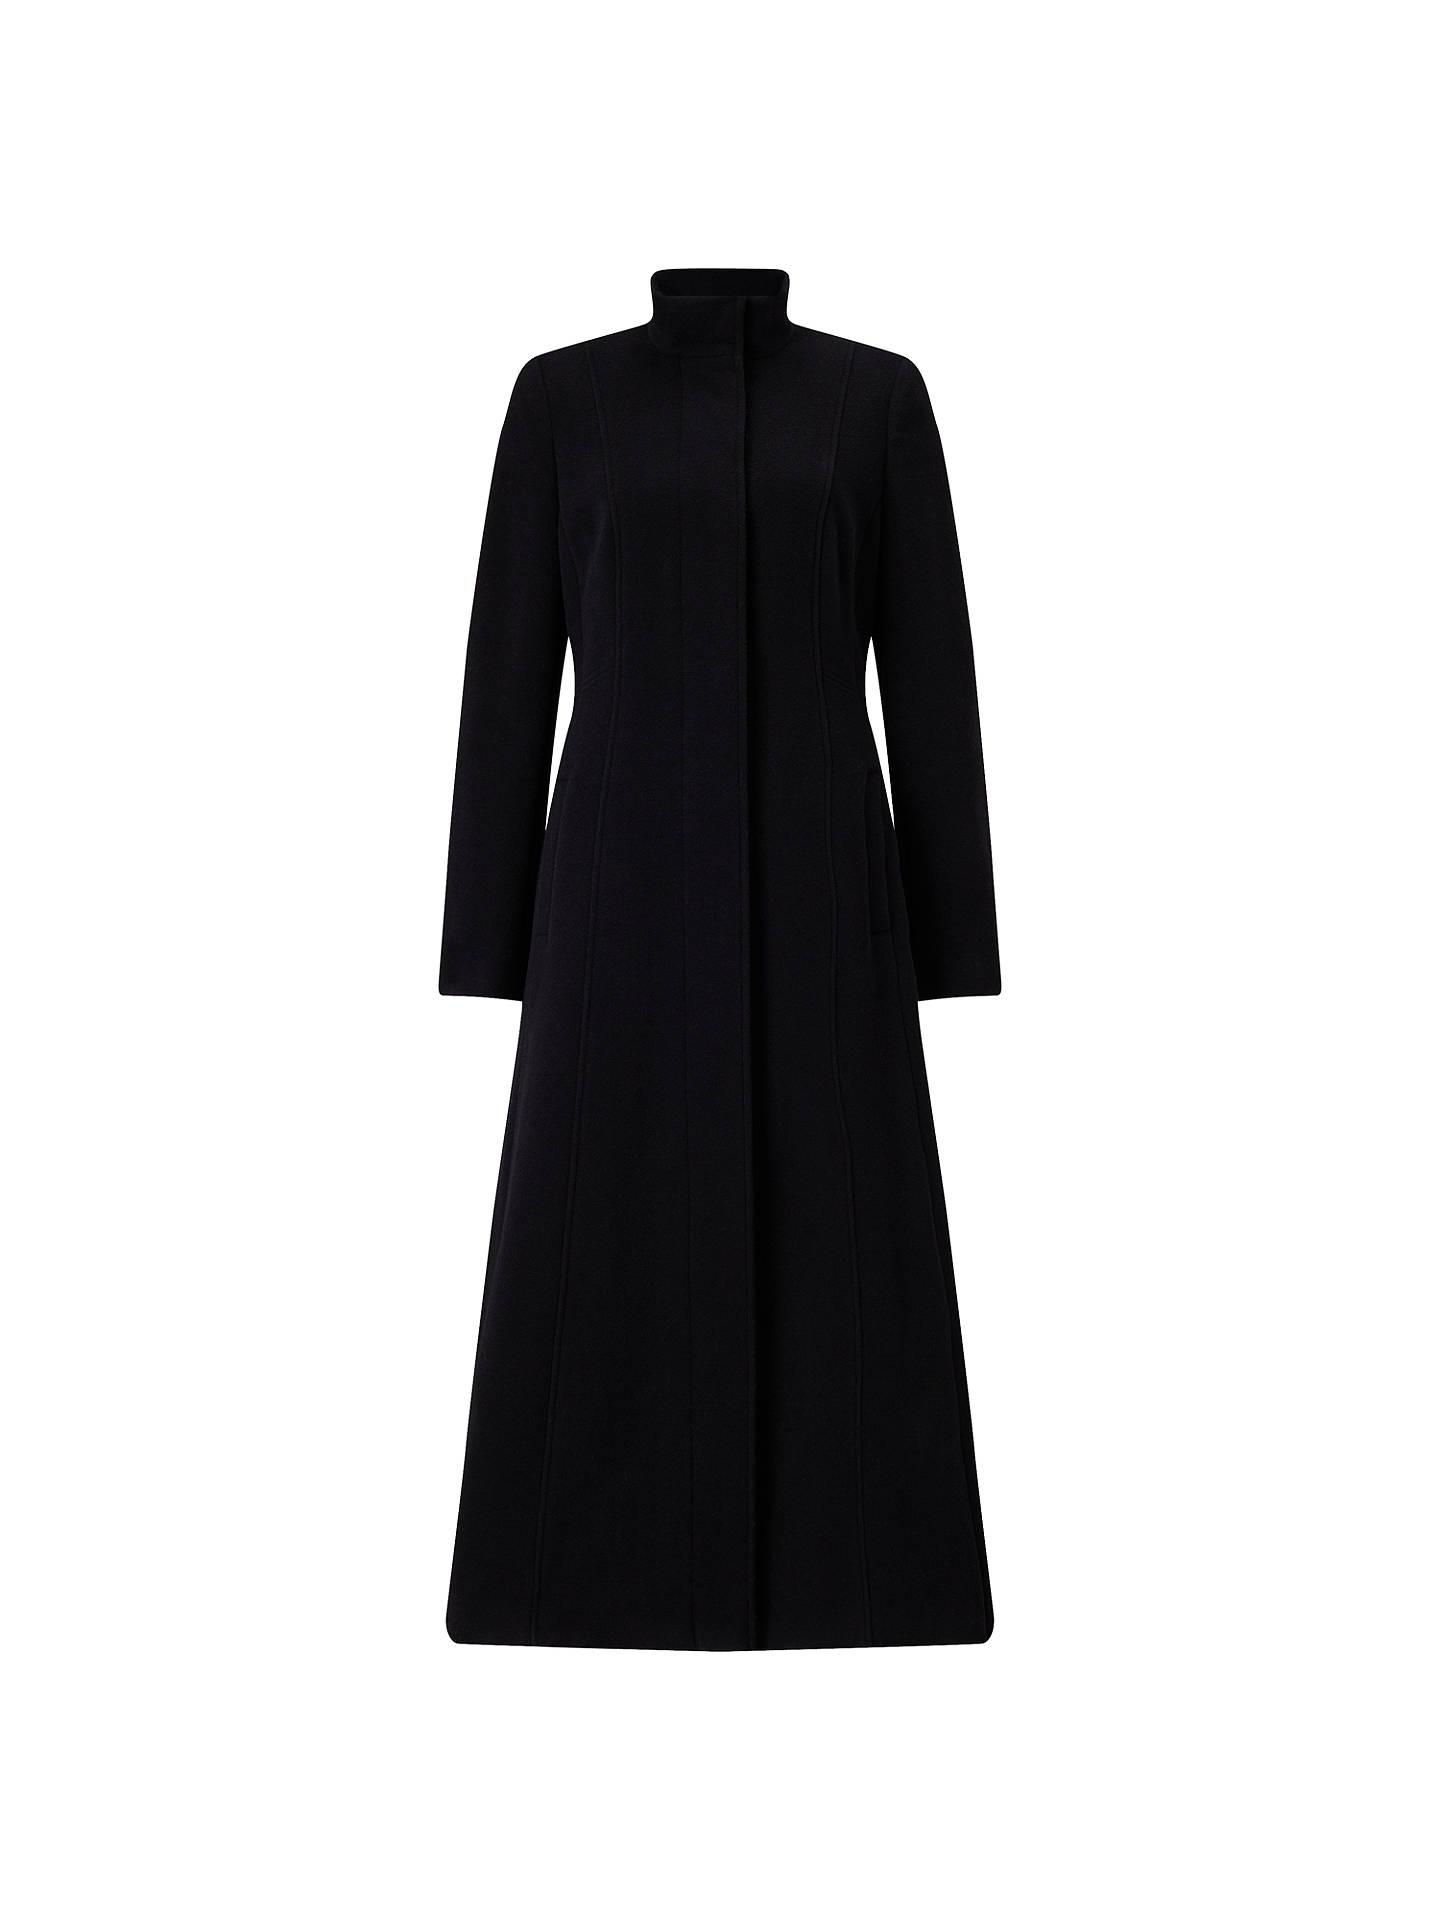 John Lewis Long Funnel Fit And Flare Coat, Black at John